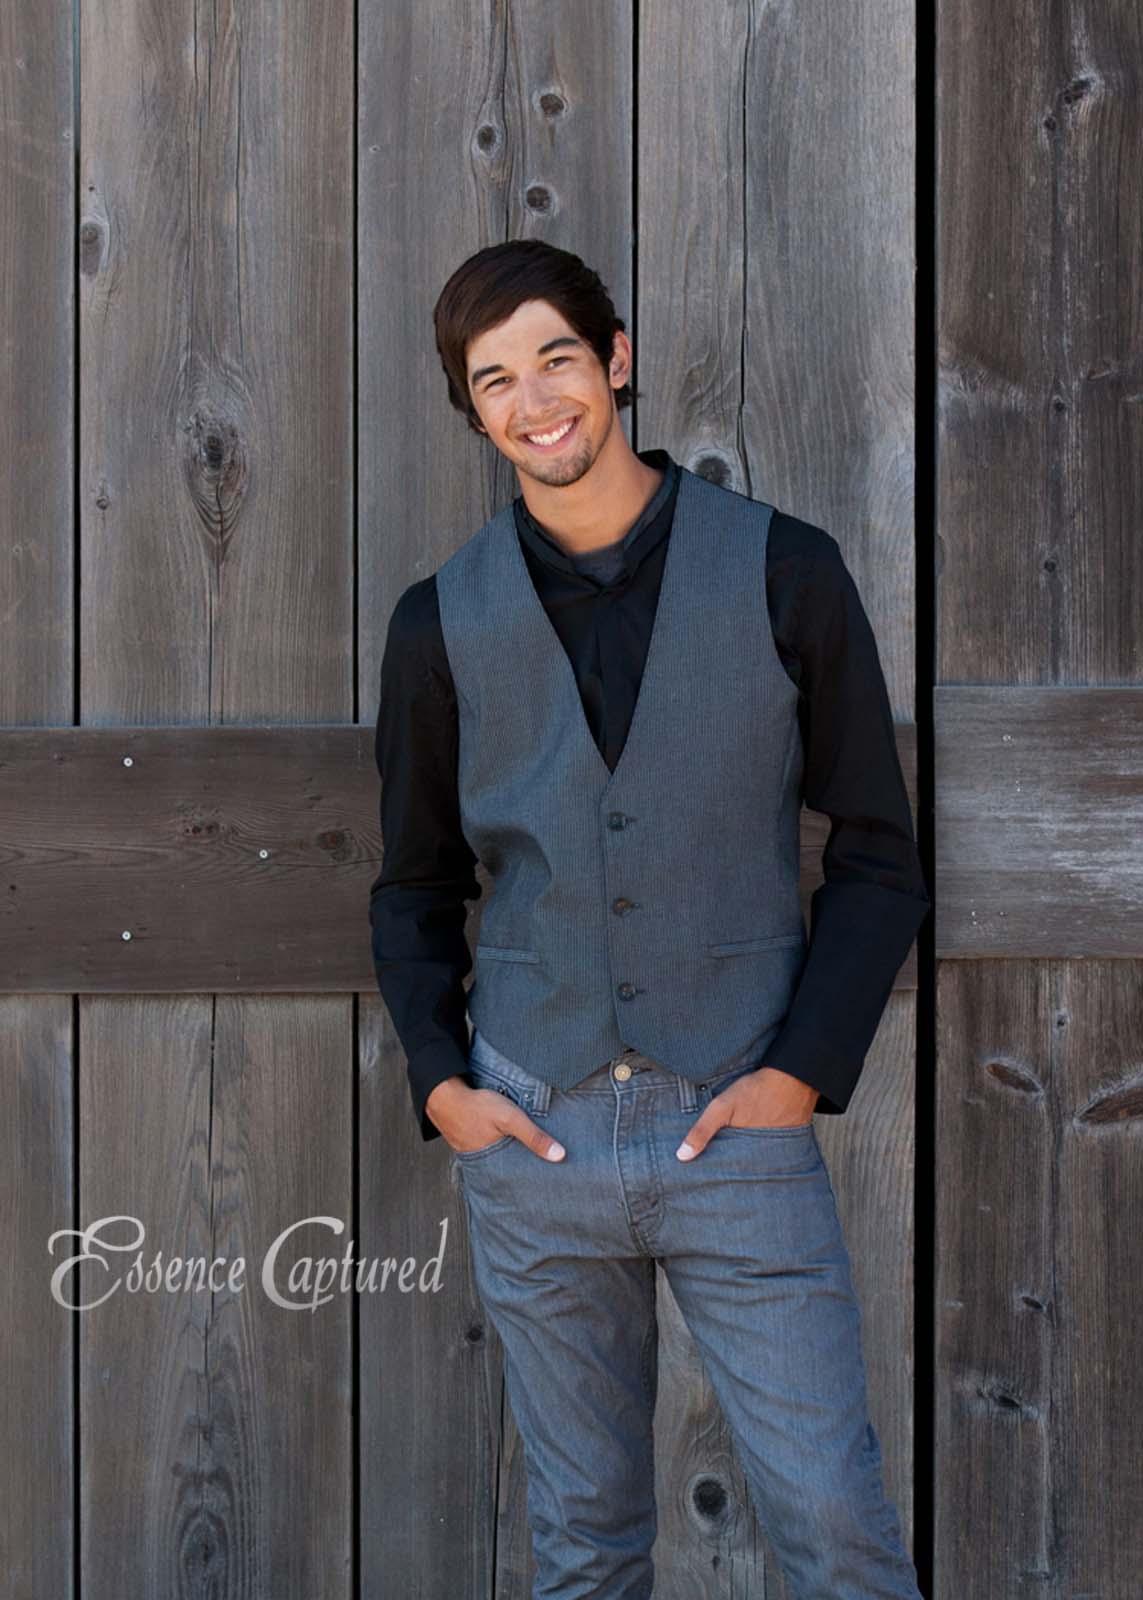 male high school senior portrait barn backdrop suit vest hands in pockets